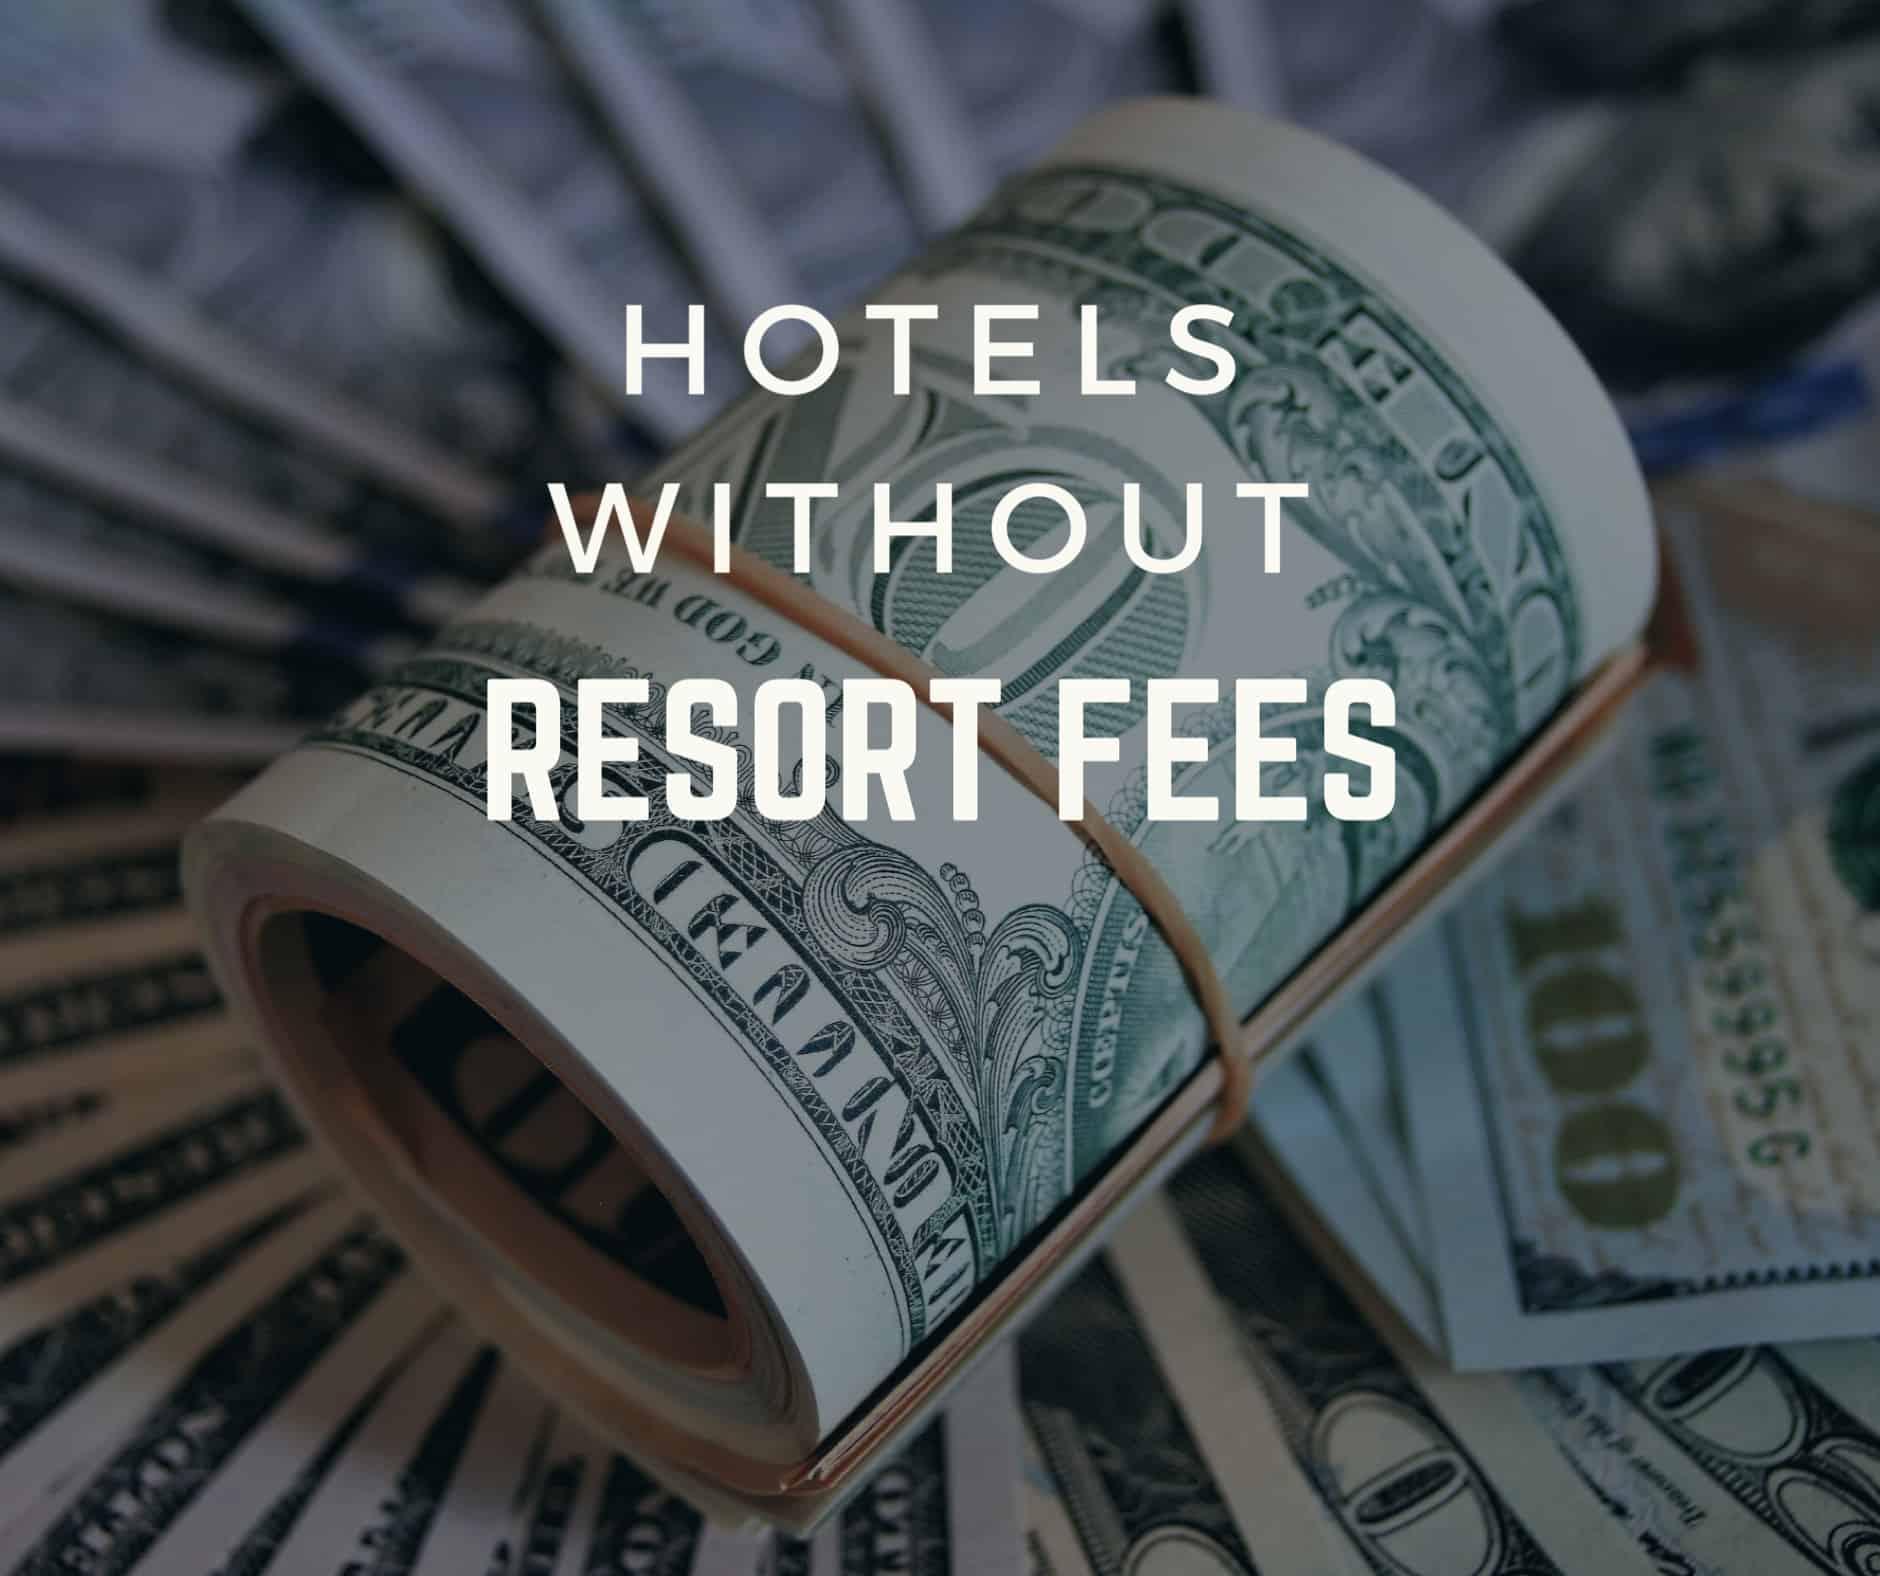 Las Vegas Resorts That Don't Charge Resort Fees